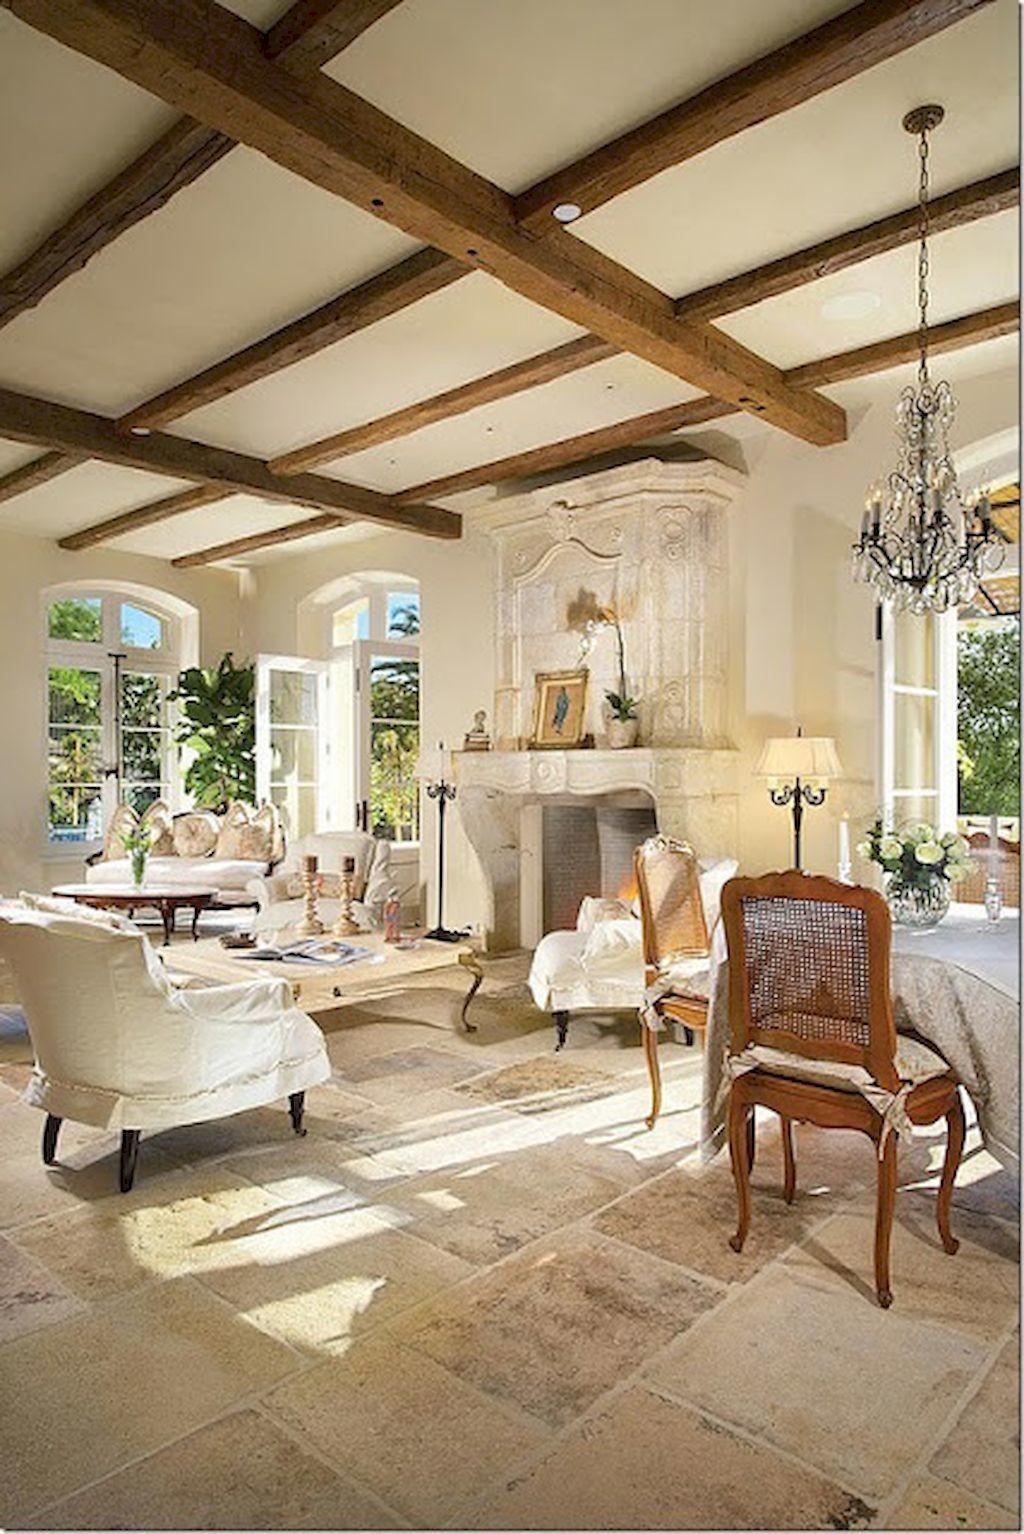 Beautiful French Country Living Room Decor Ideas Decoratorist 57349